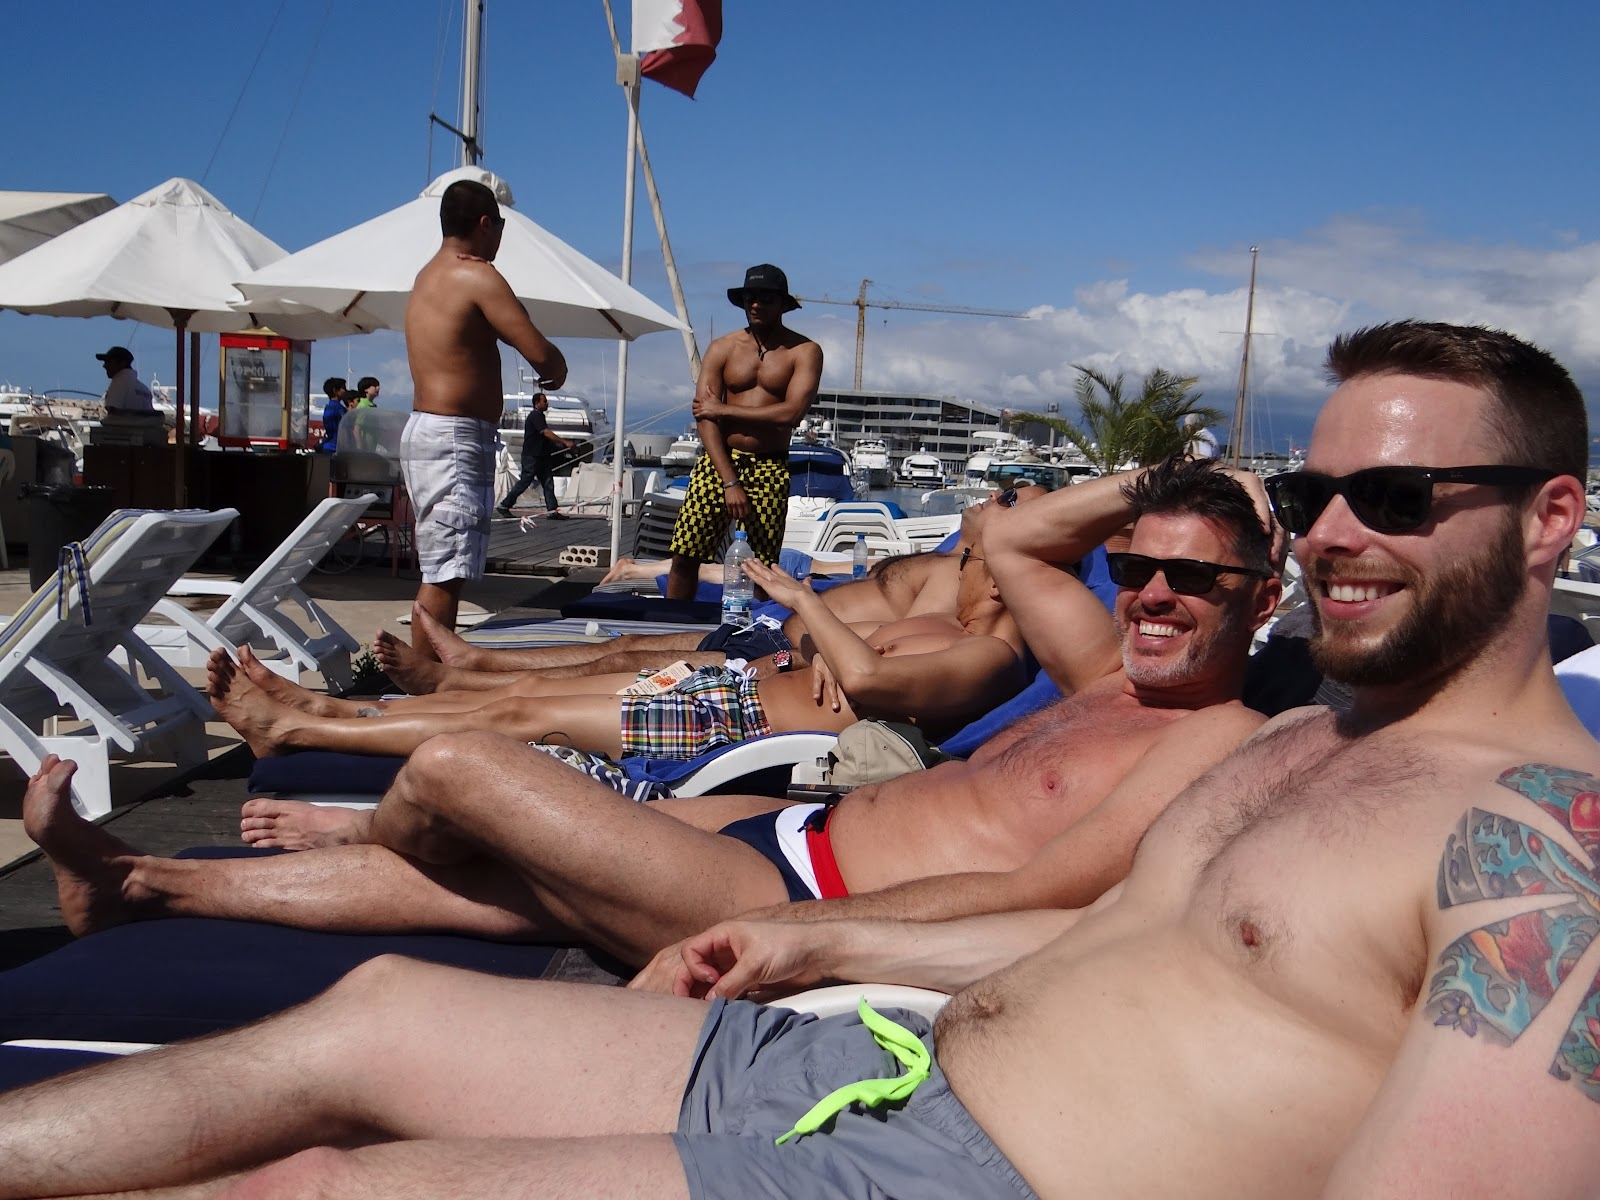 Curvy gay porn forum rapidshare denial jock